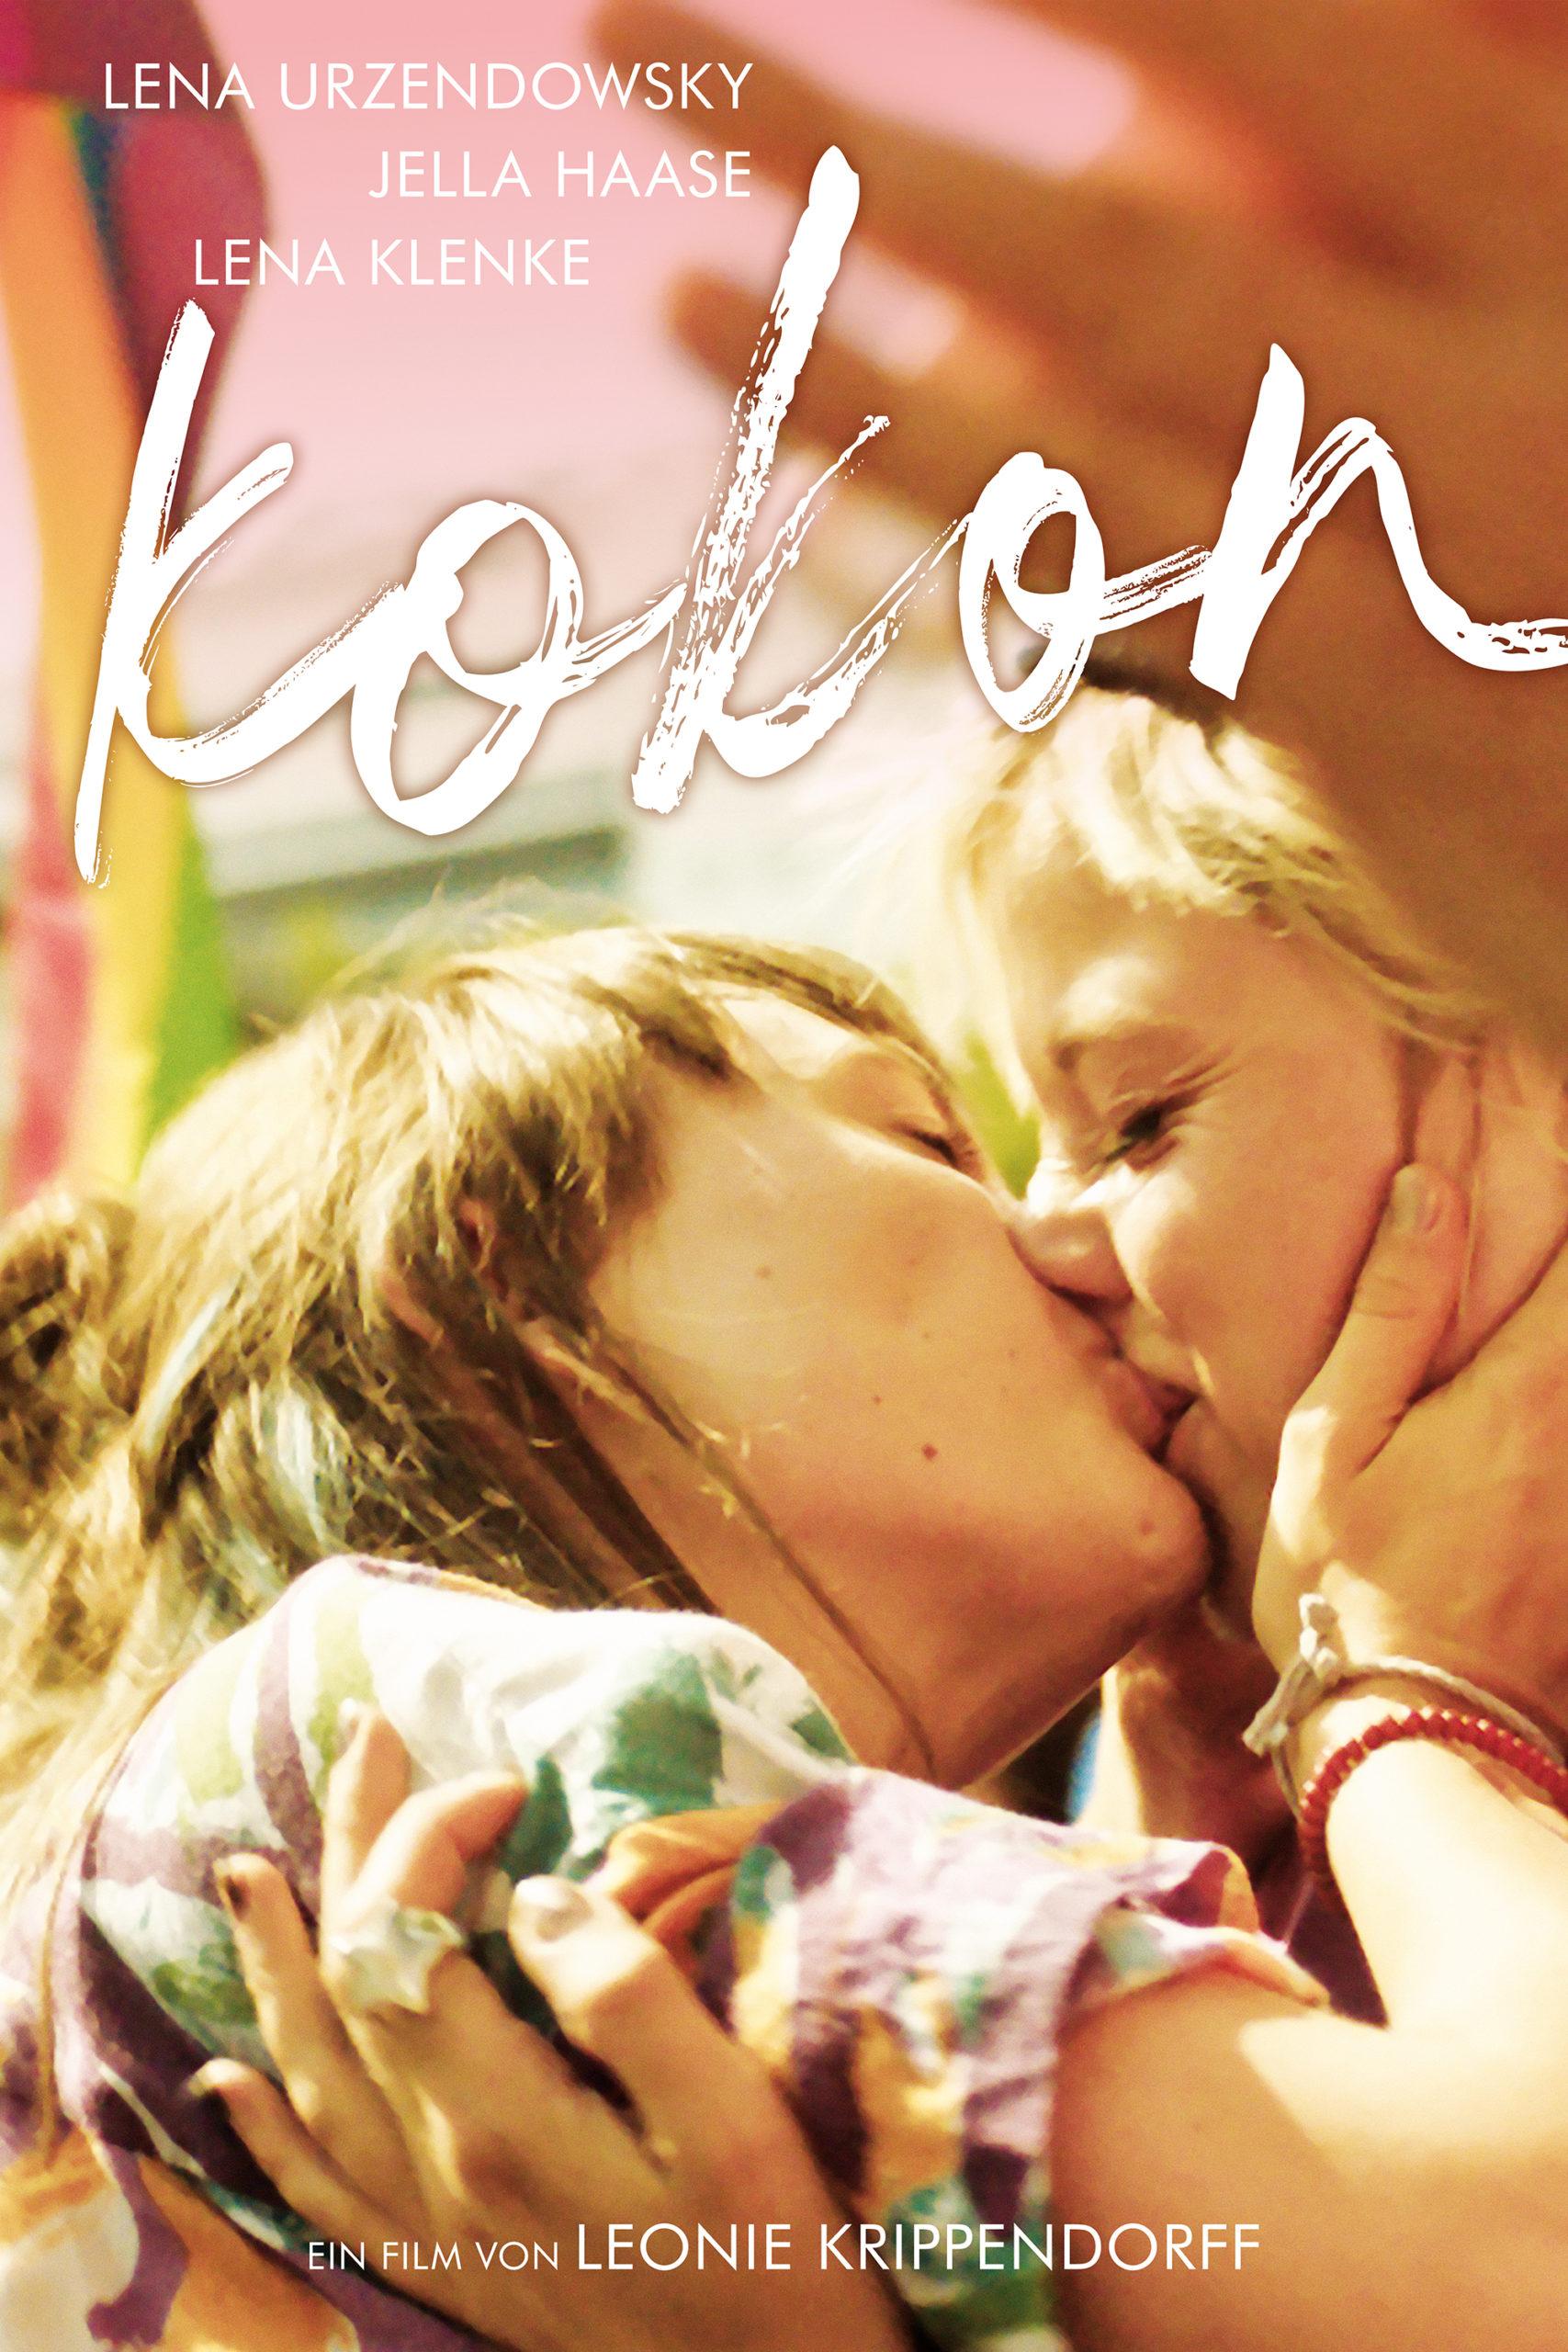 Kokon – Jetzt digital verfügbar